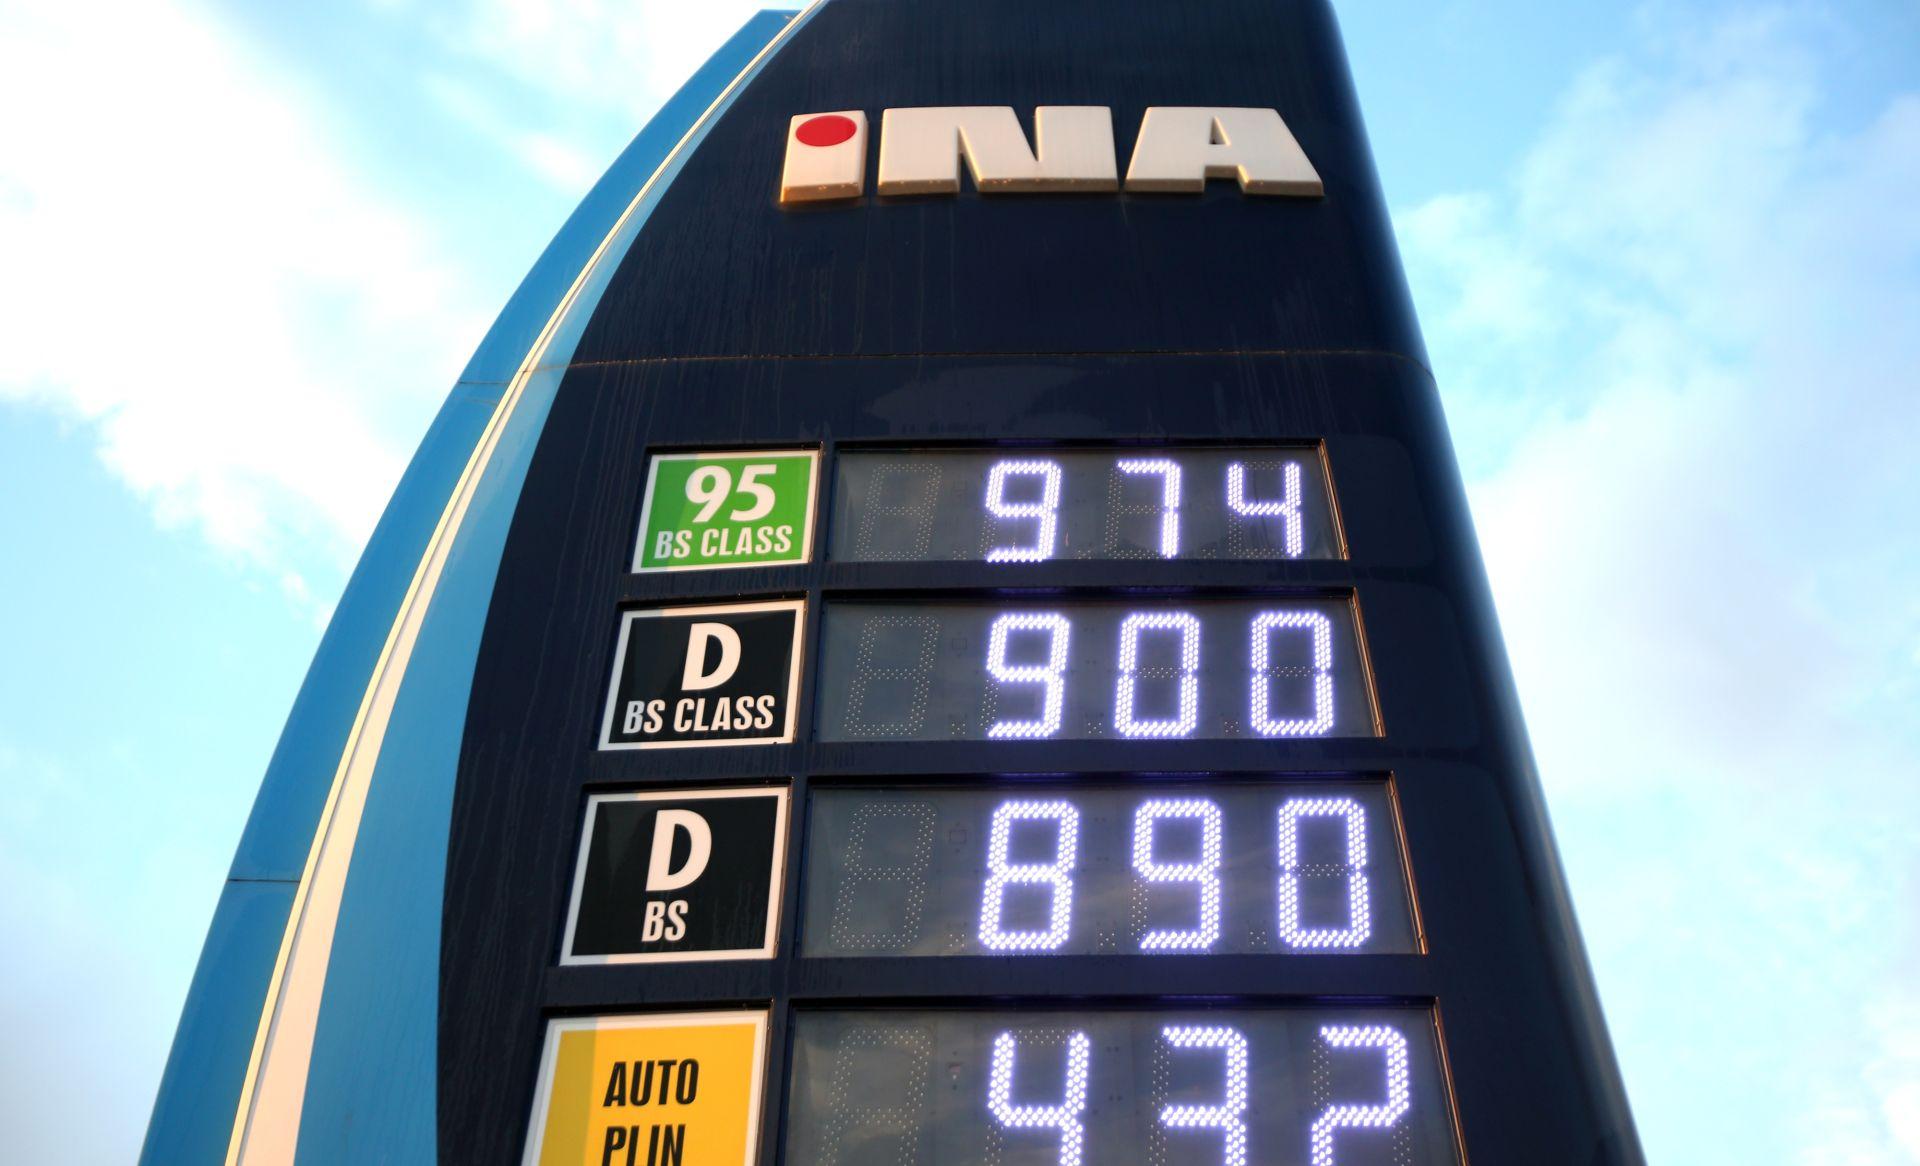 Skok dionica MOL-a podigao indeks Budimpeštanske burze nadomak rekordnih razina